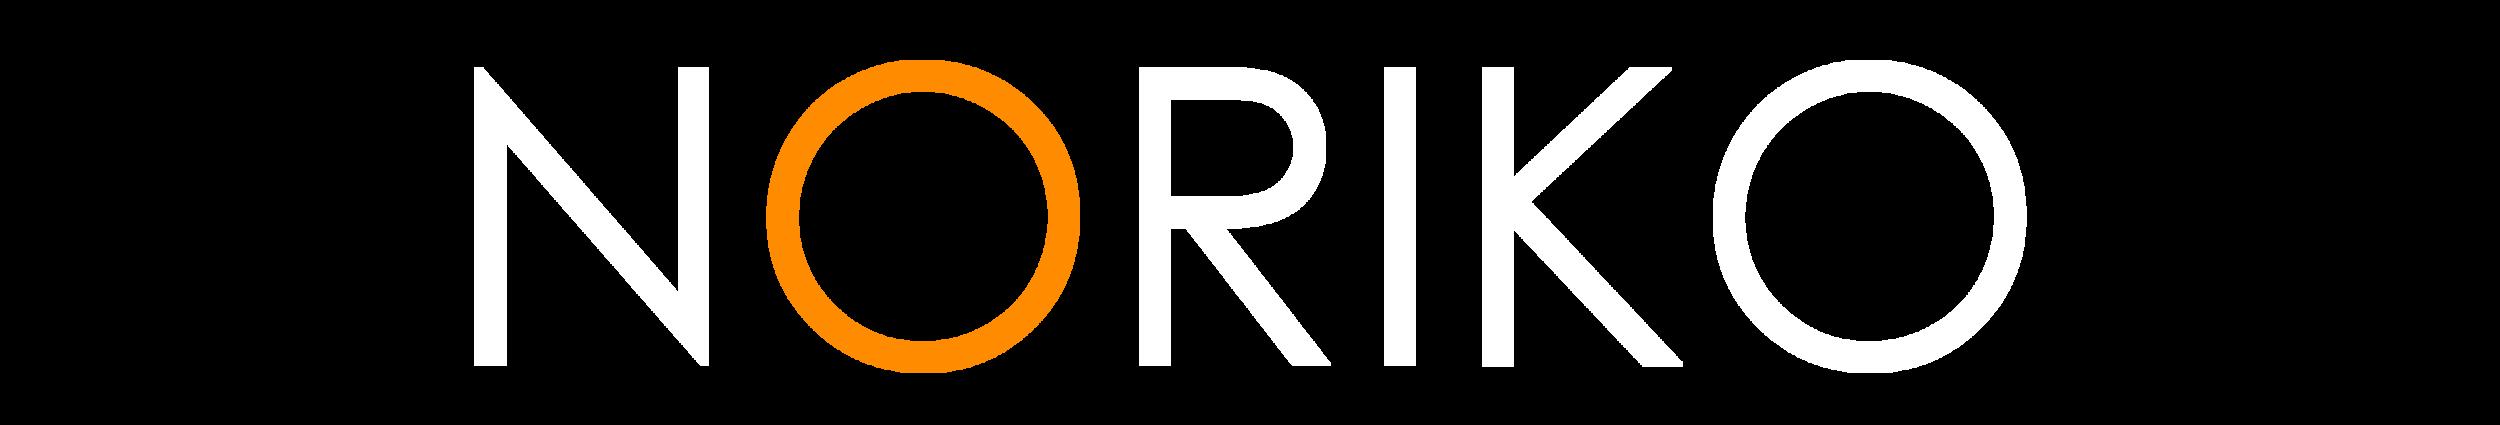 Noriko_Logo.png